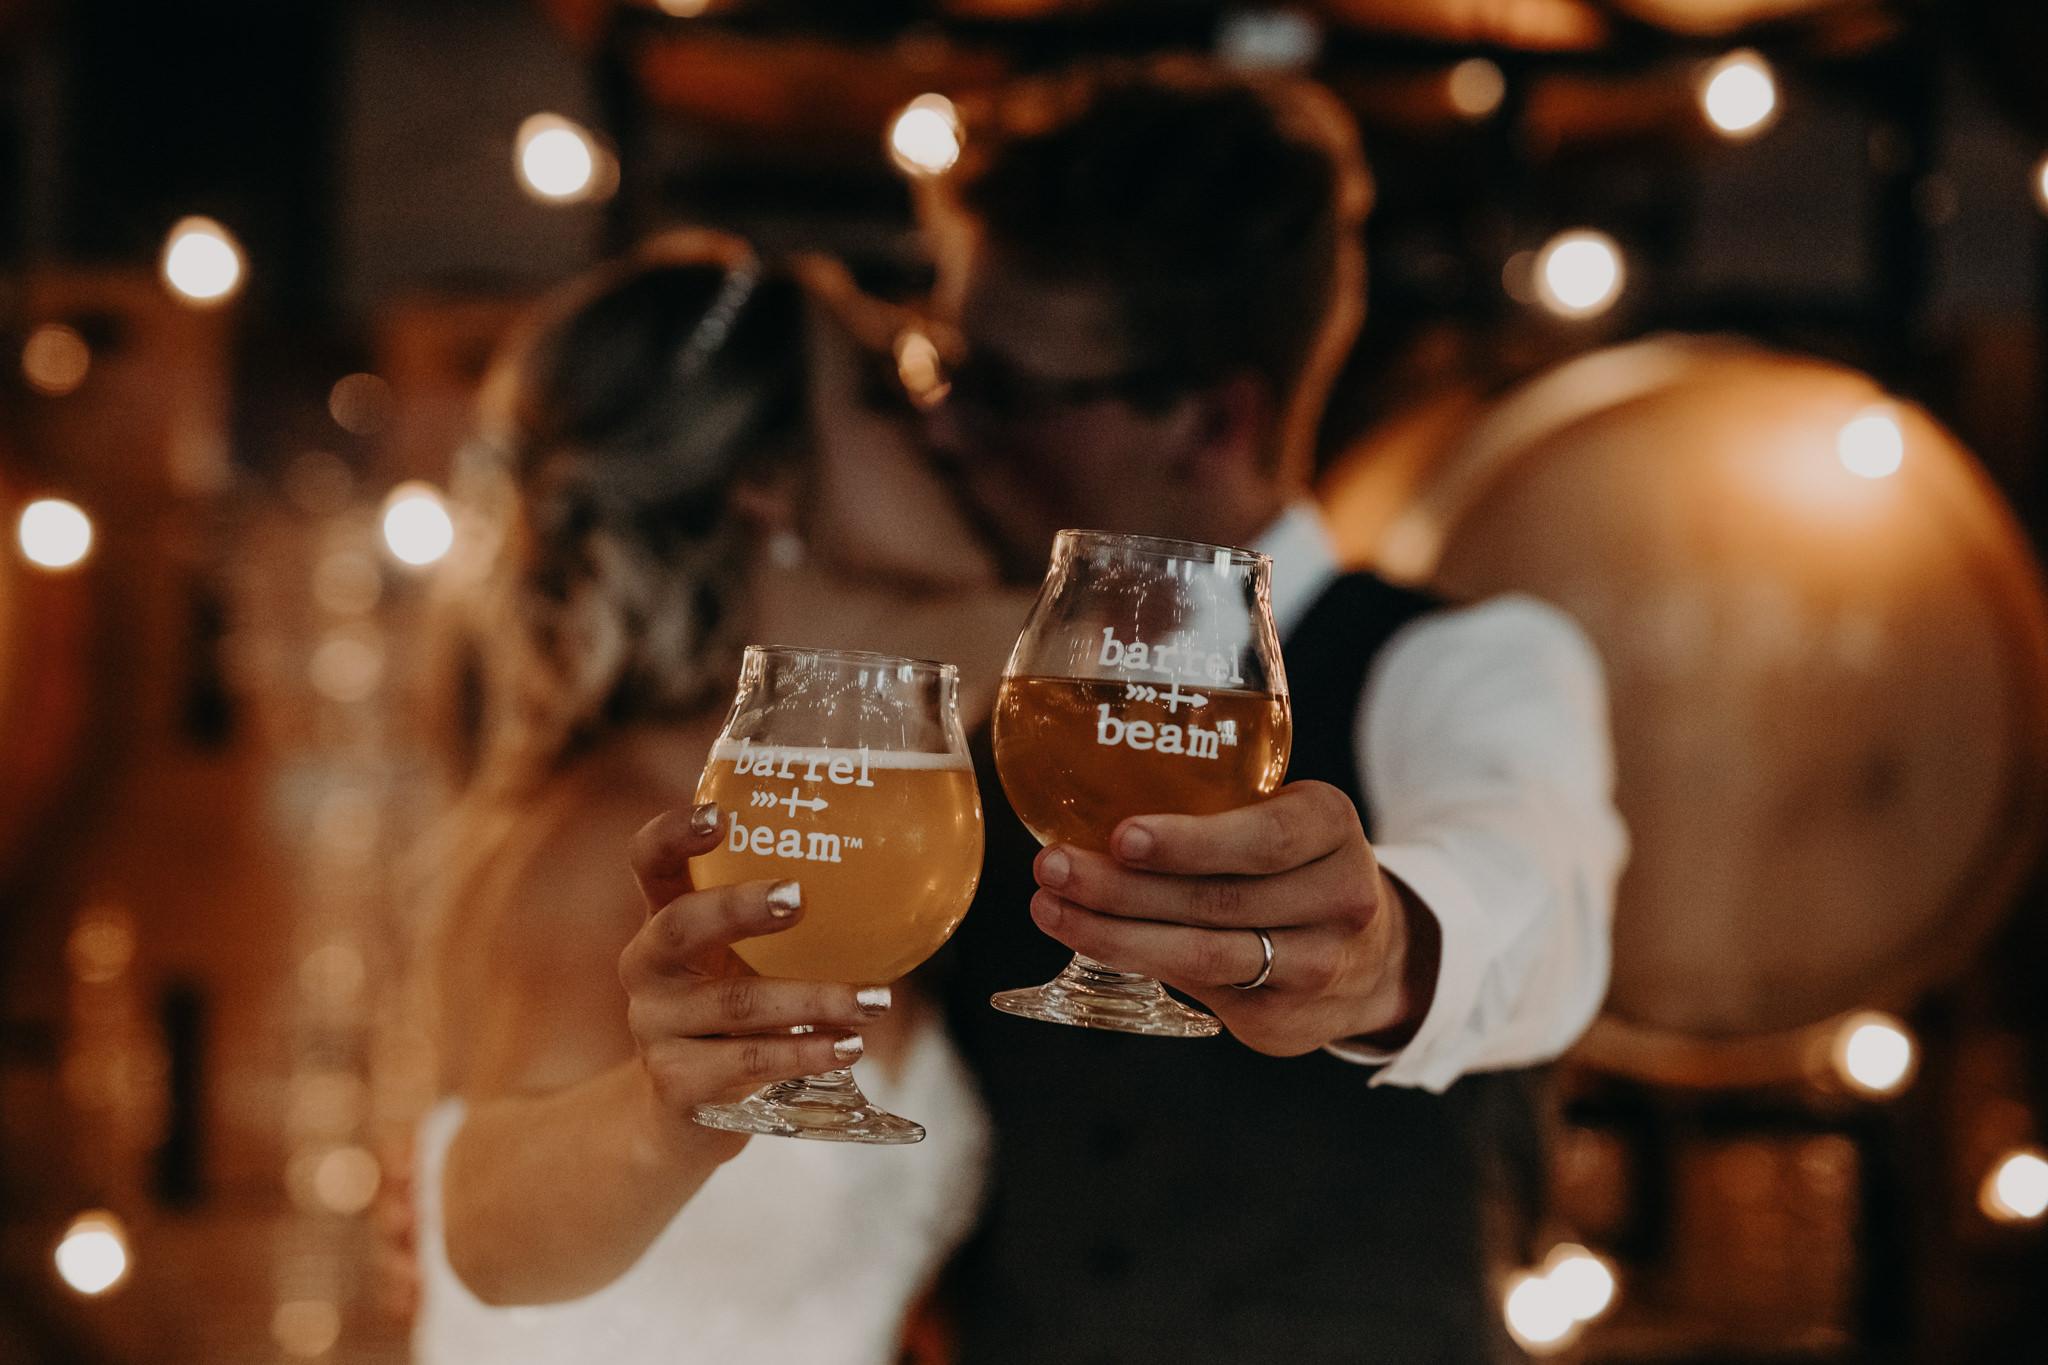 Bride and groom holding Barrel + Beam beer glasses